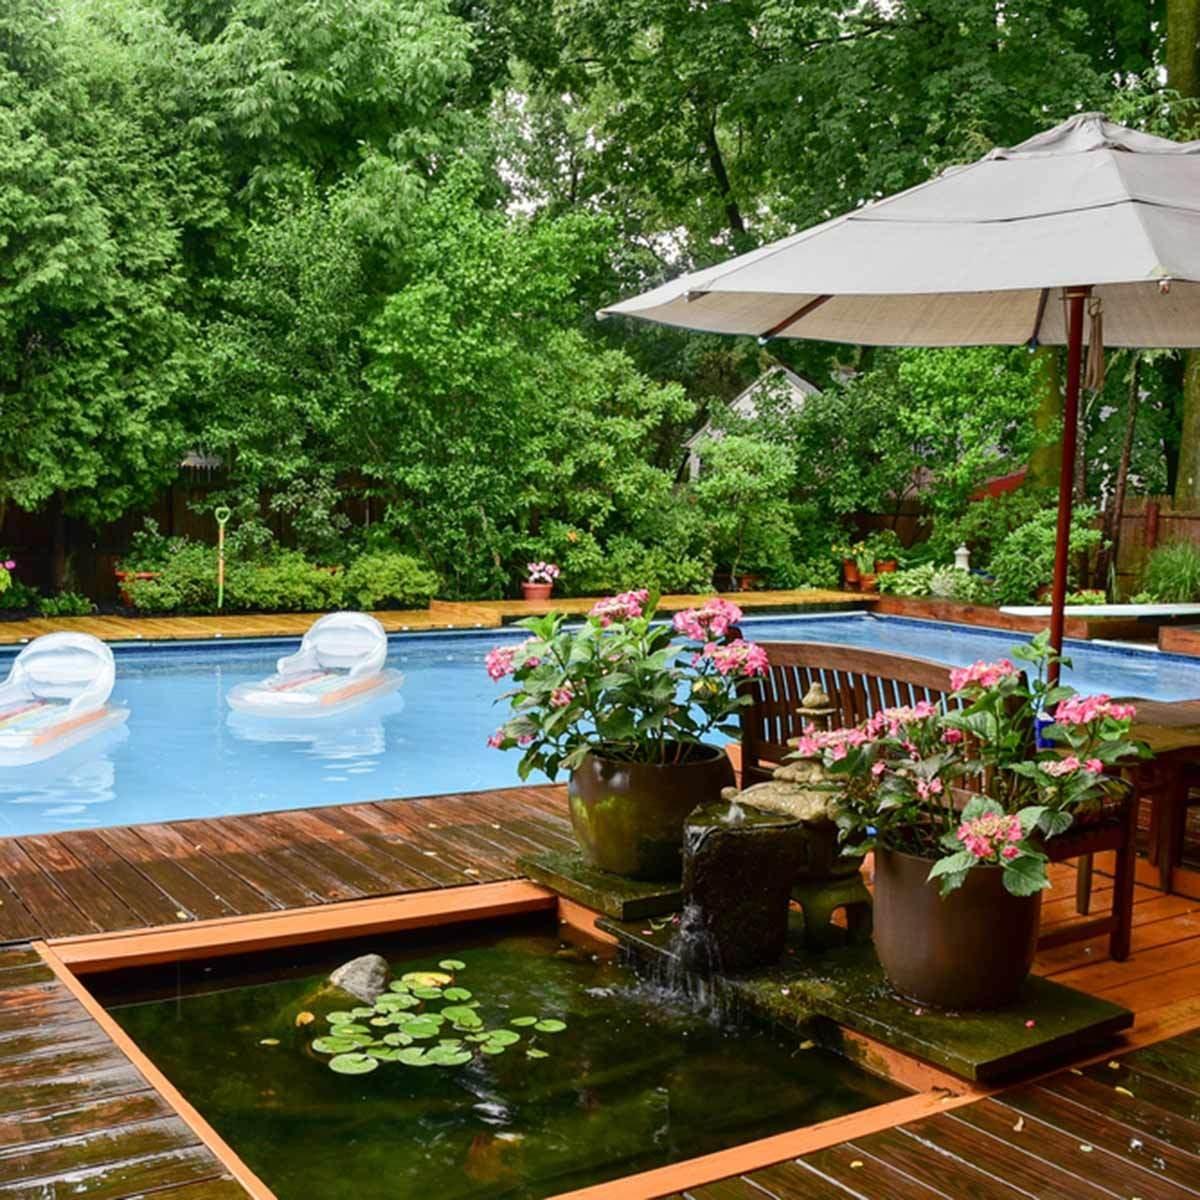 Idyllic Ponds Backyard Swimming S Family Handyman Backyards Without S S outdoor Amazing Backyards Without Pools